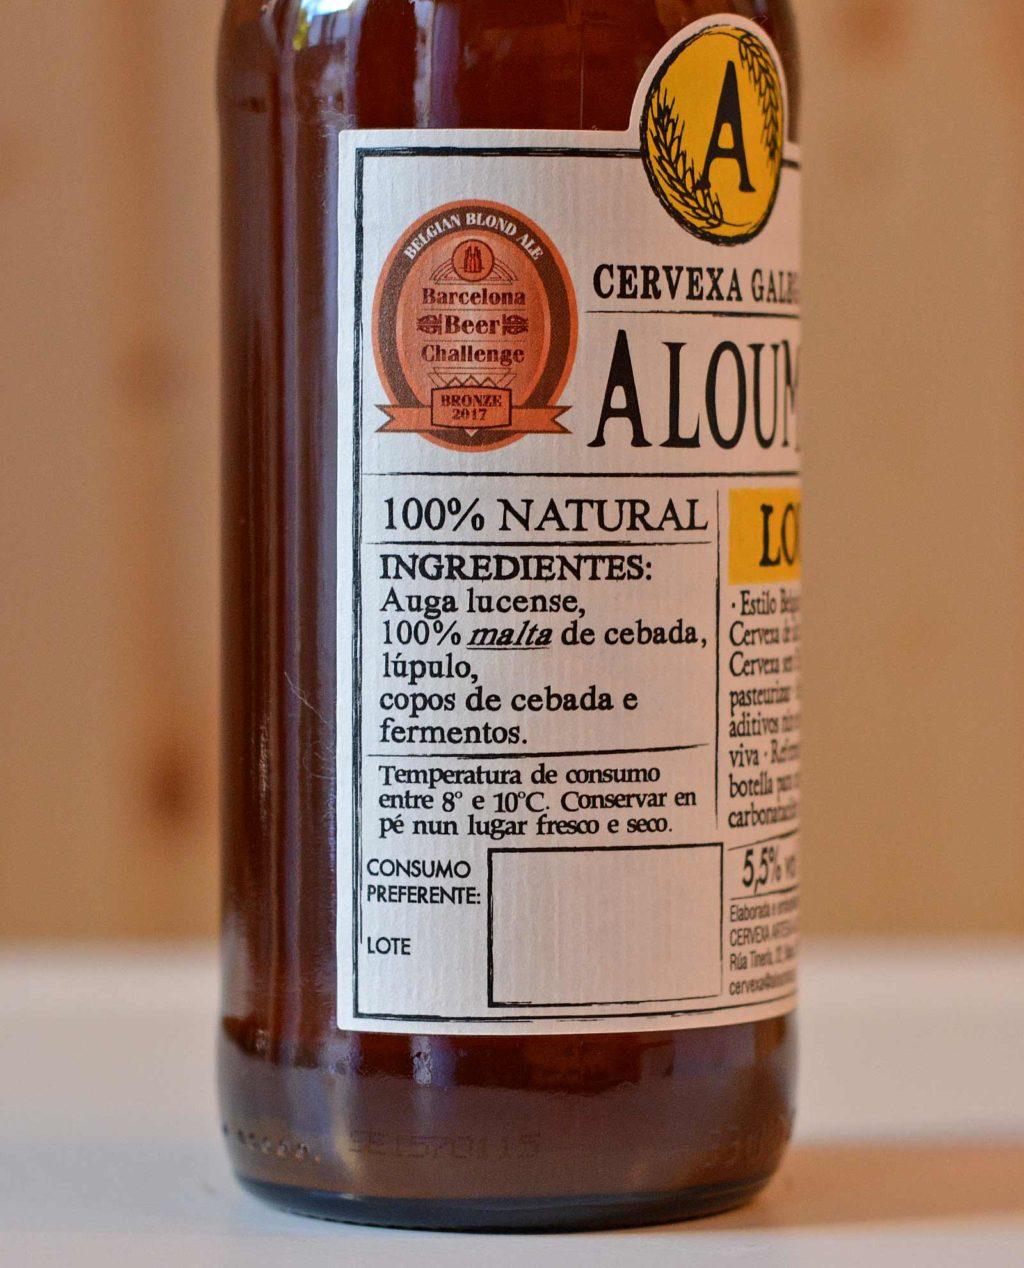 aloumina-cerveza-artesana-craft-beer-lugo-galicia-loura-bbc-barcelonabeerchallenge-belgianblondeale-c